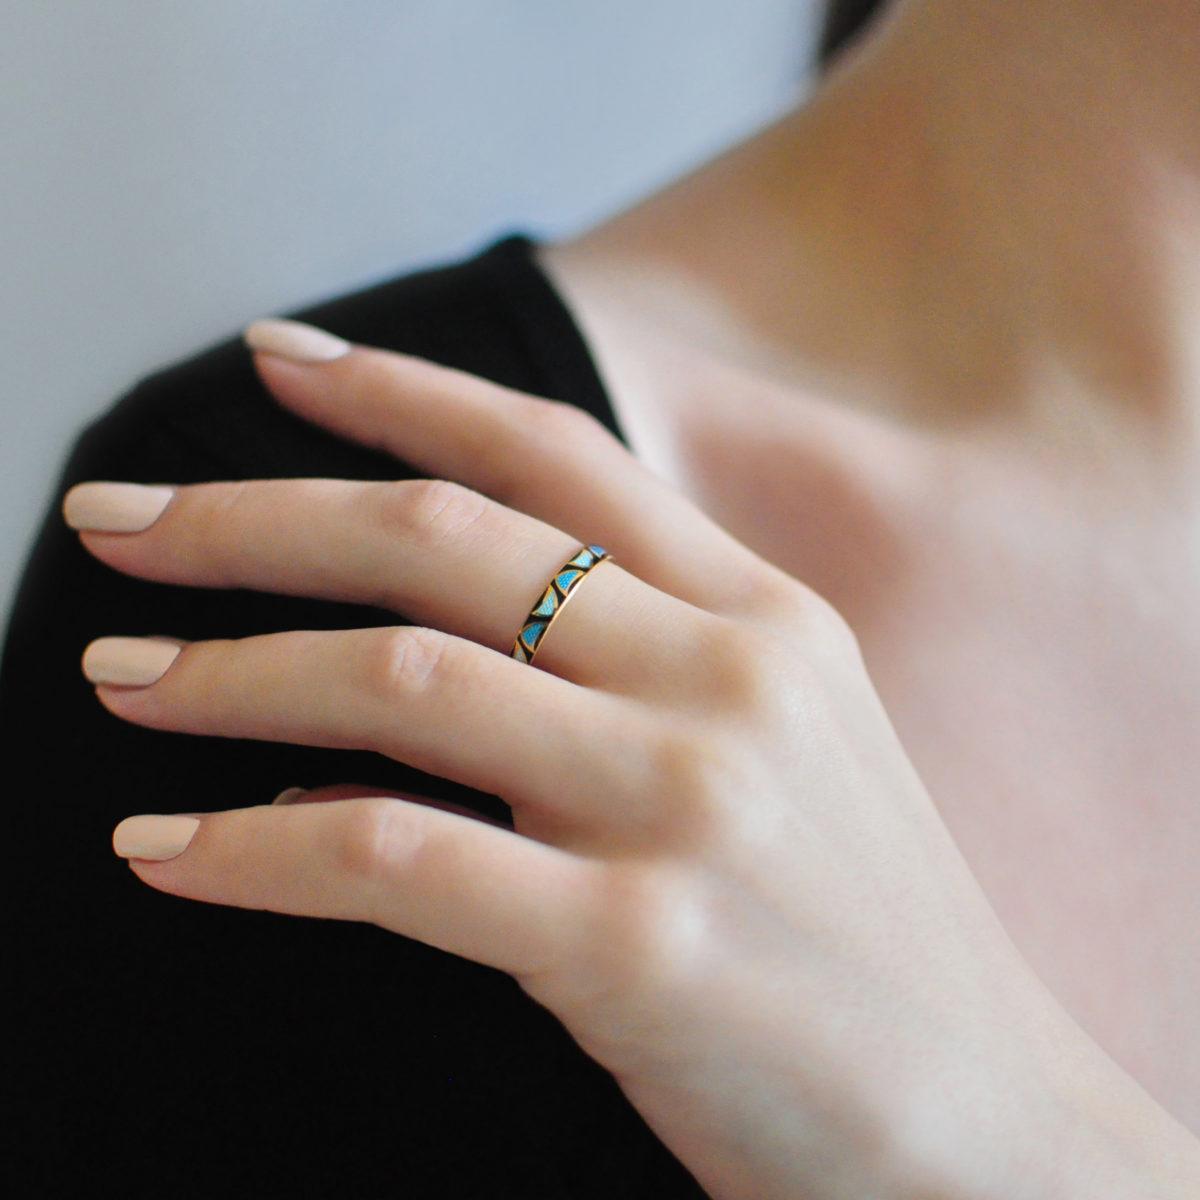 Zolochenie chernaya 3 1200x1200 - Кольцо «Седмица» (золочение), черная